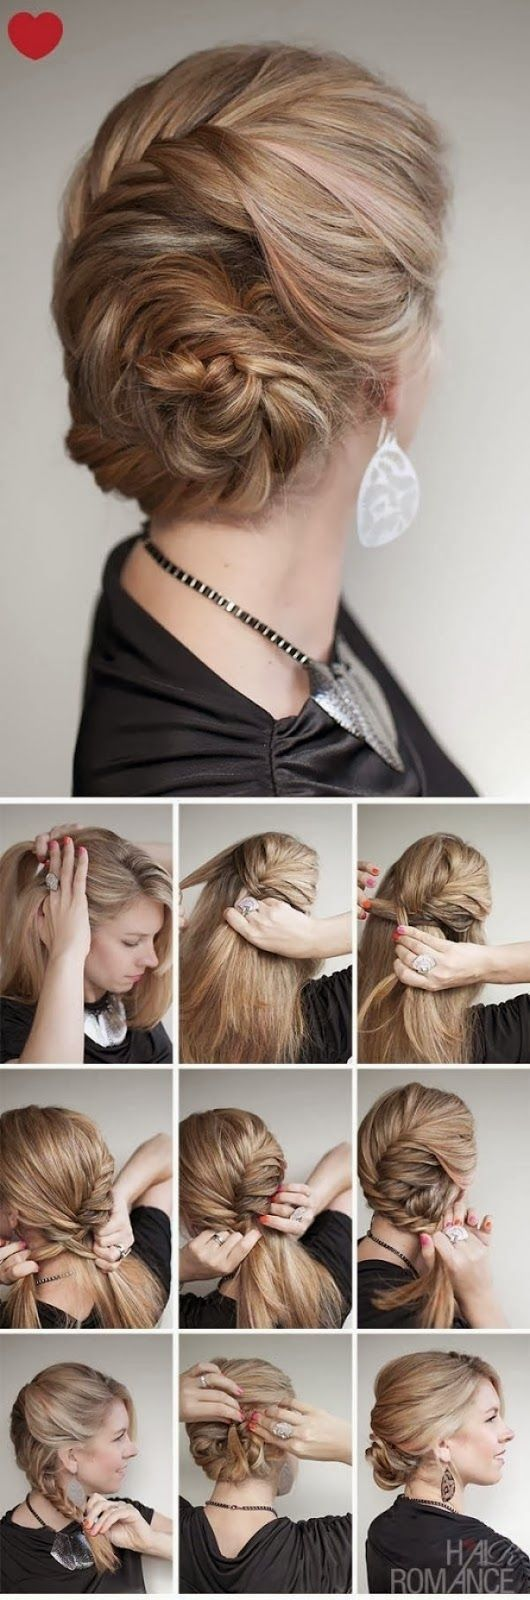 Stylish Bun for long hair – Step By Step Hair Tutorial